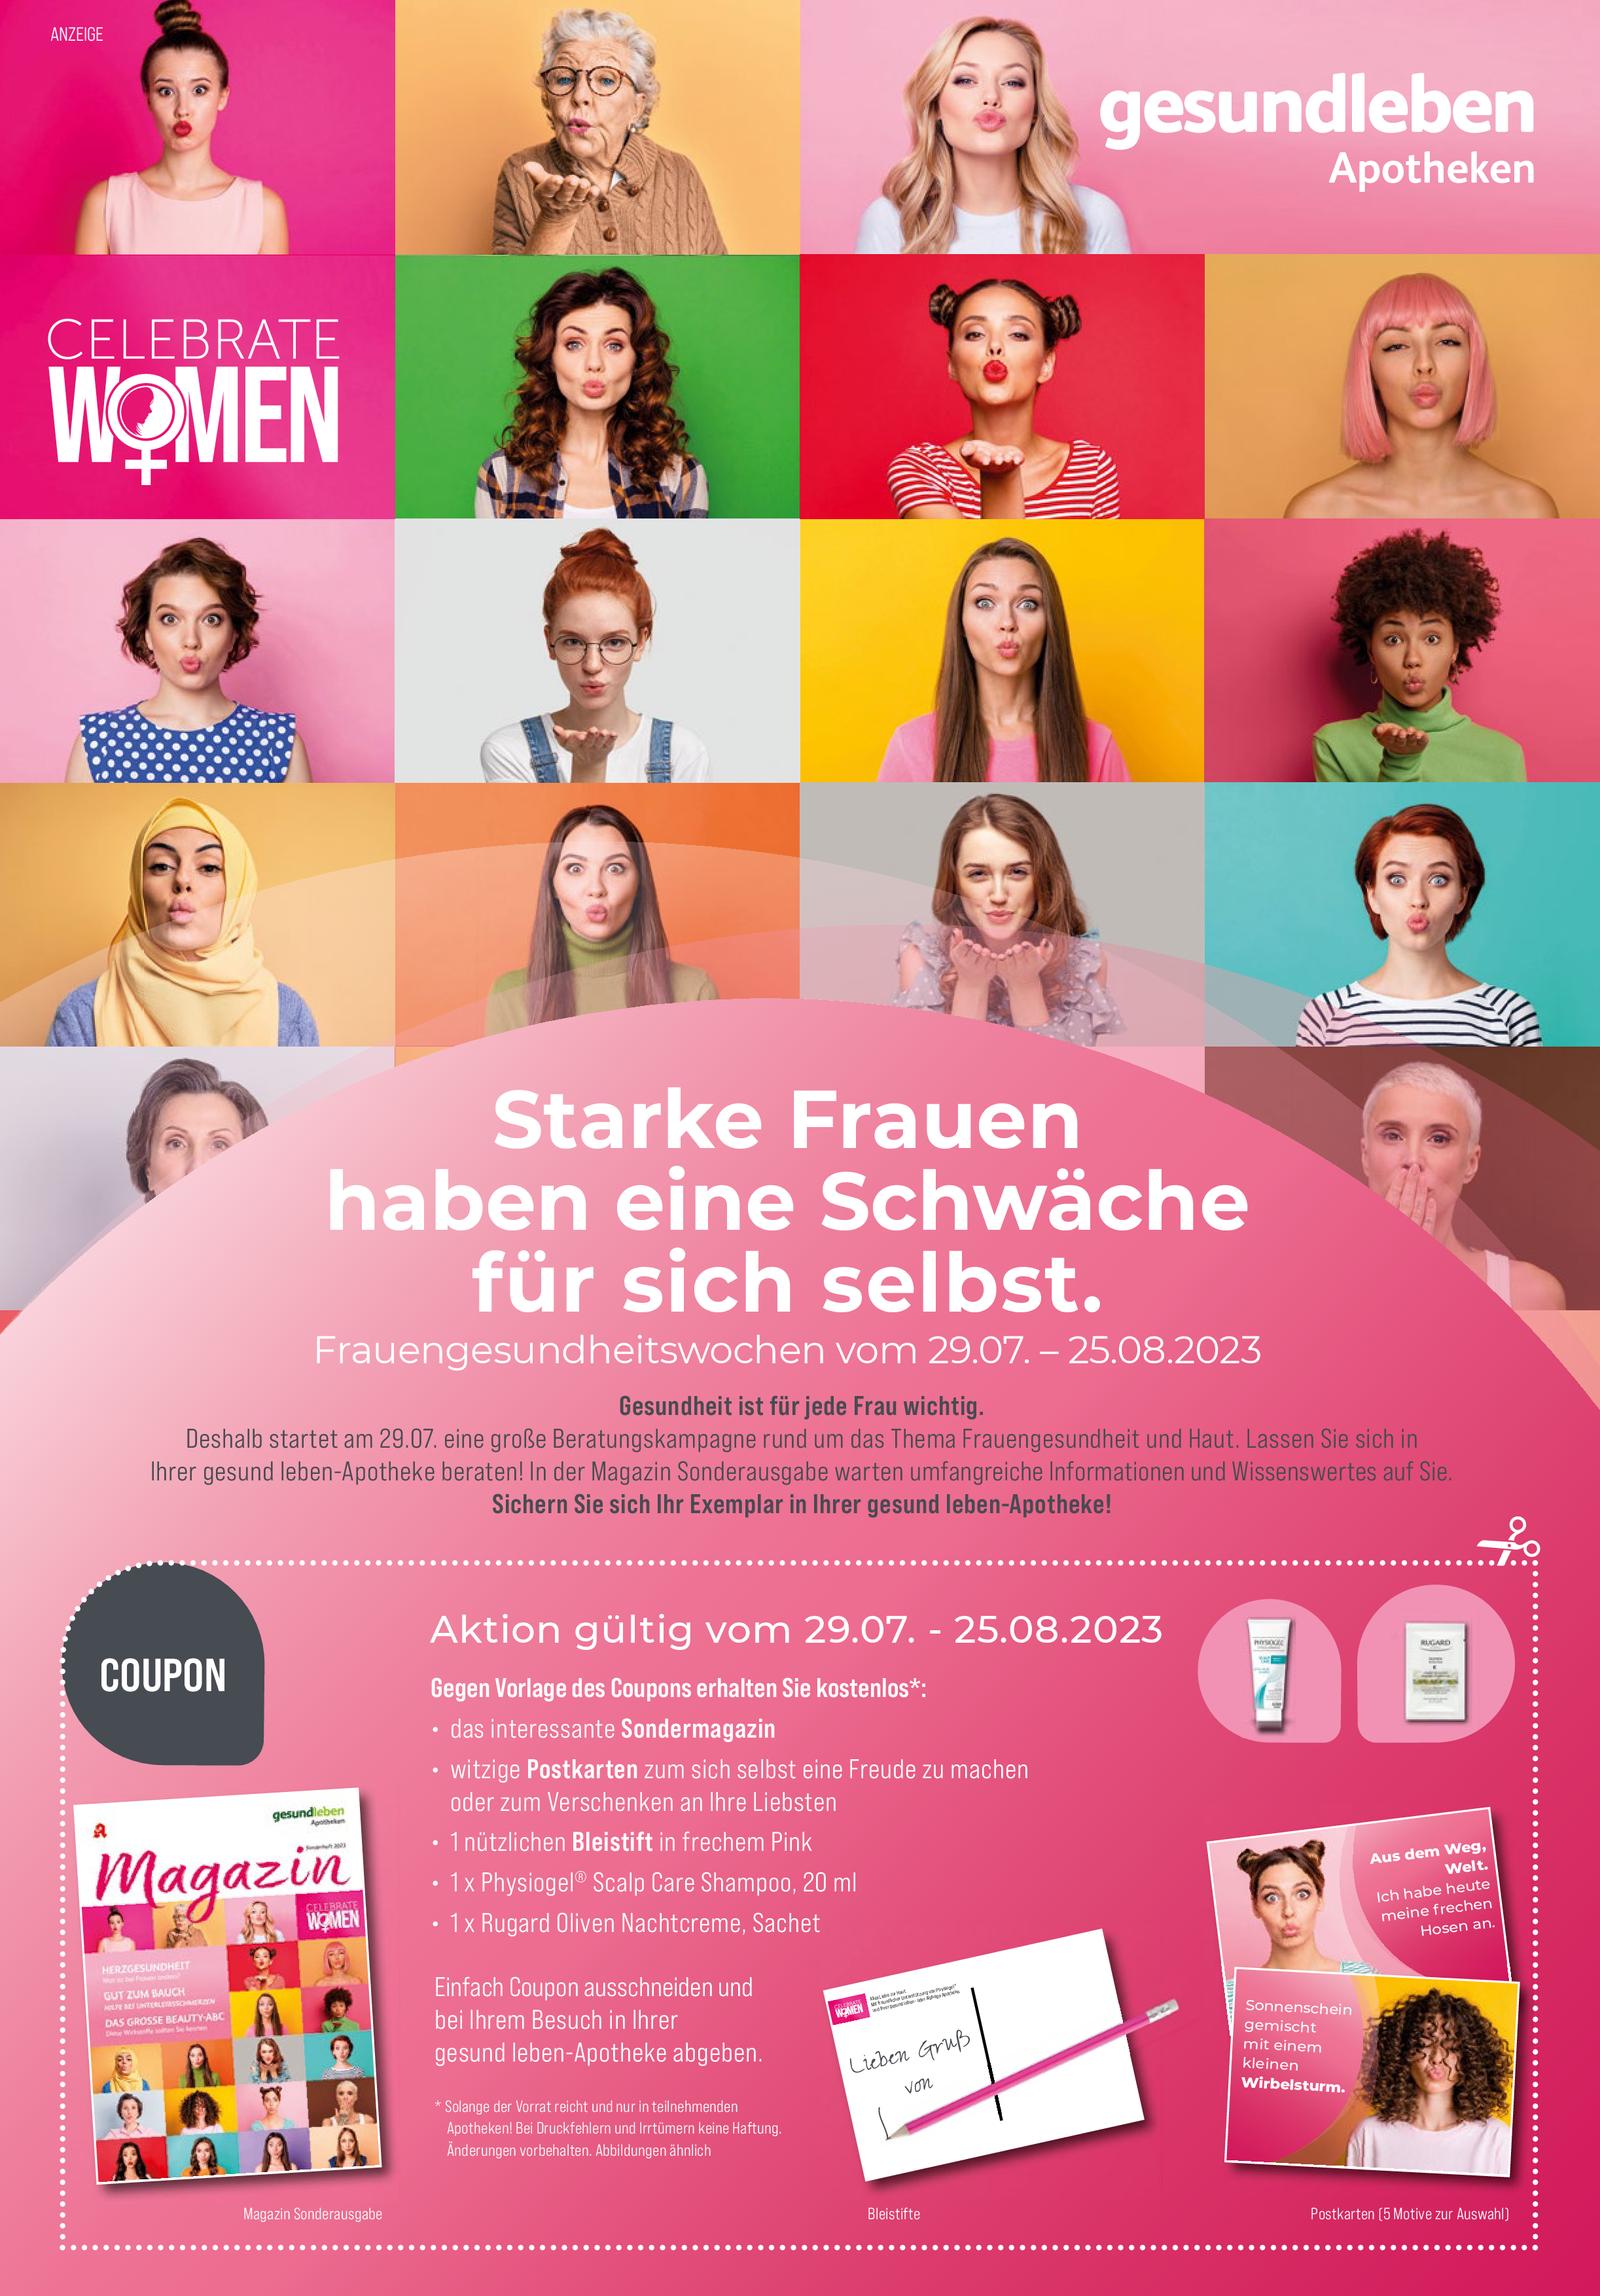 https://mein-uploads.apocdn.net/14700/leaflets/gesundleben_niedrig-Seite5.png